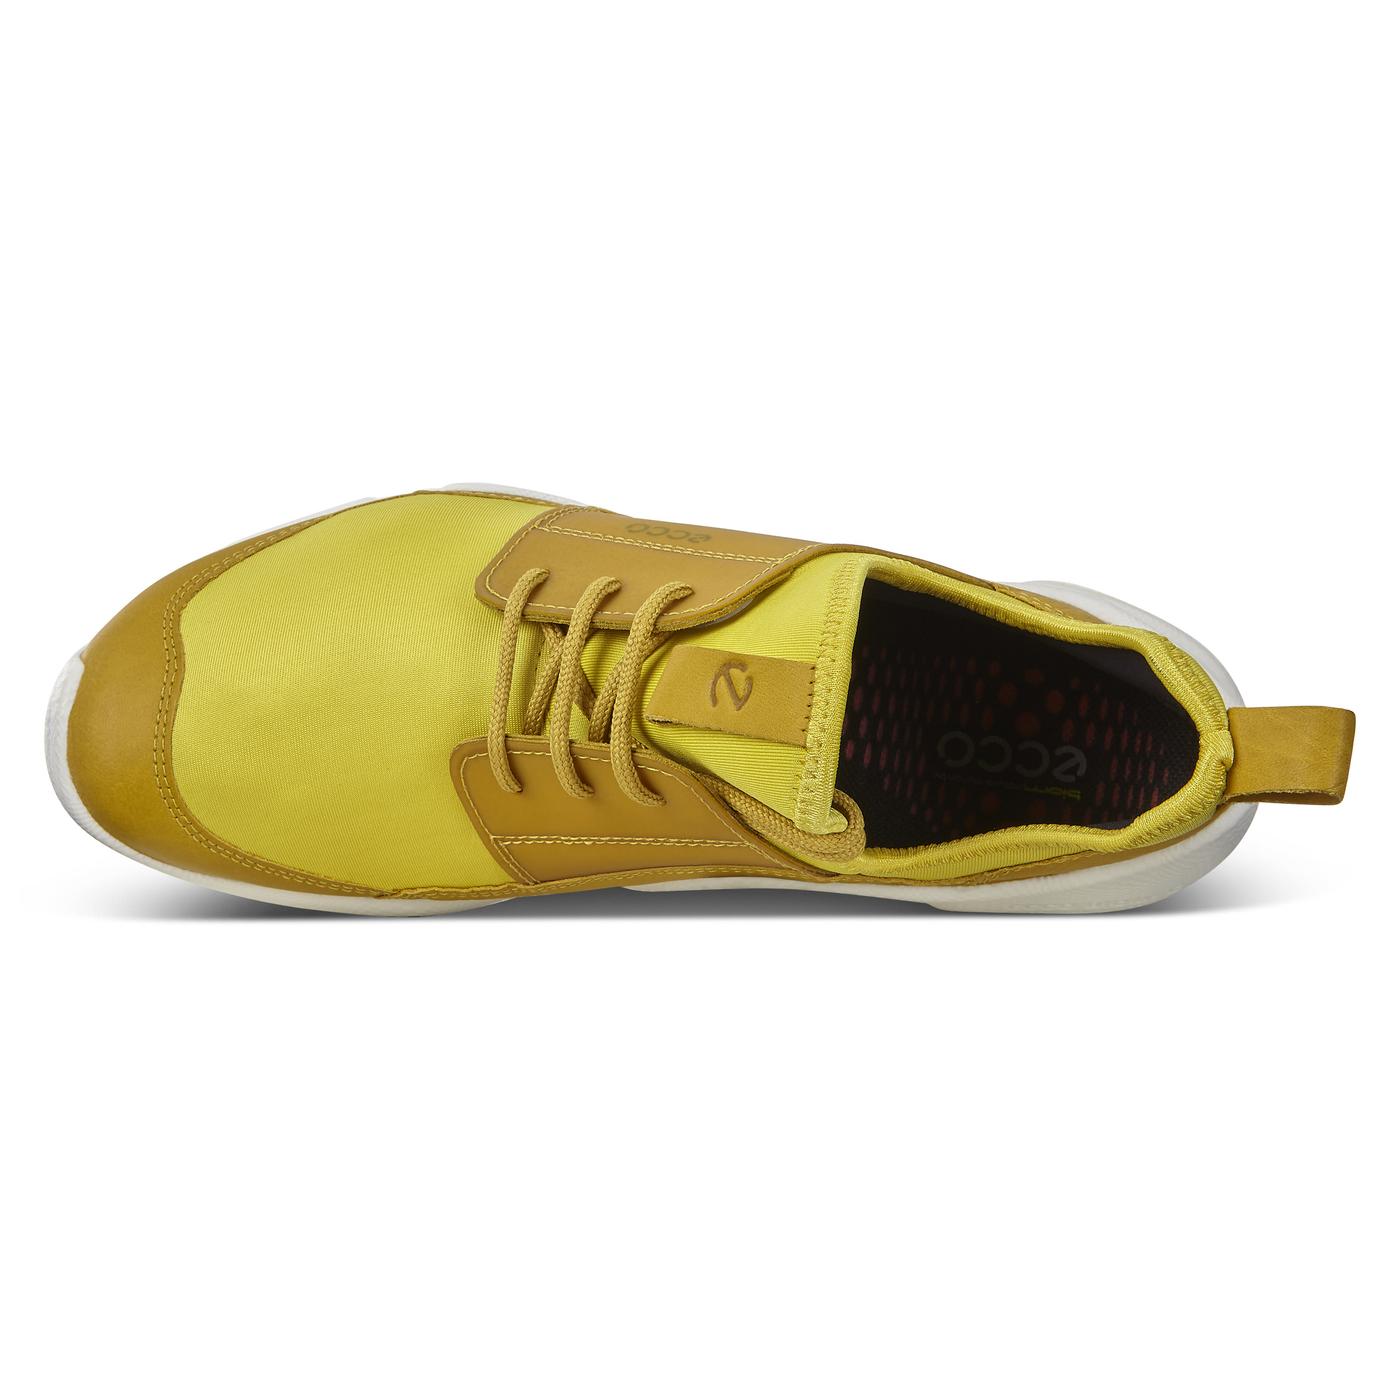 ECCO BIOM C 3.0 Womens Premium Sneaker